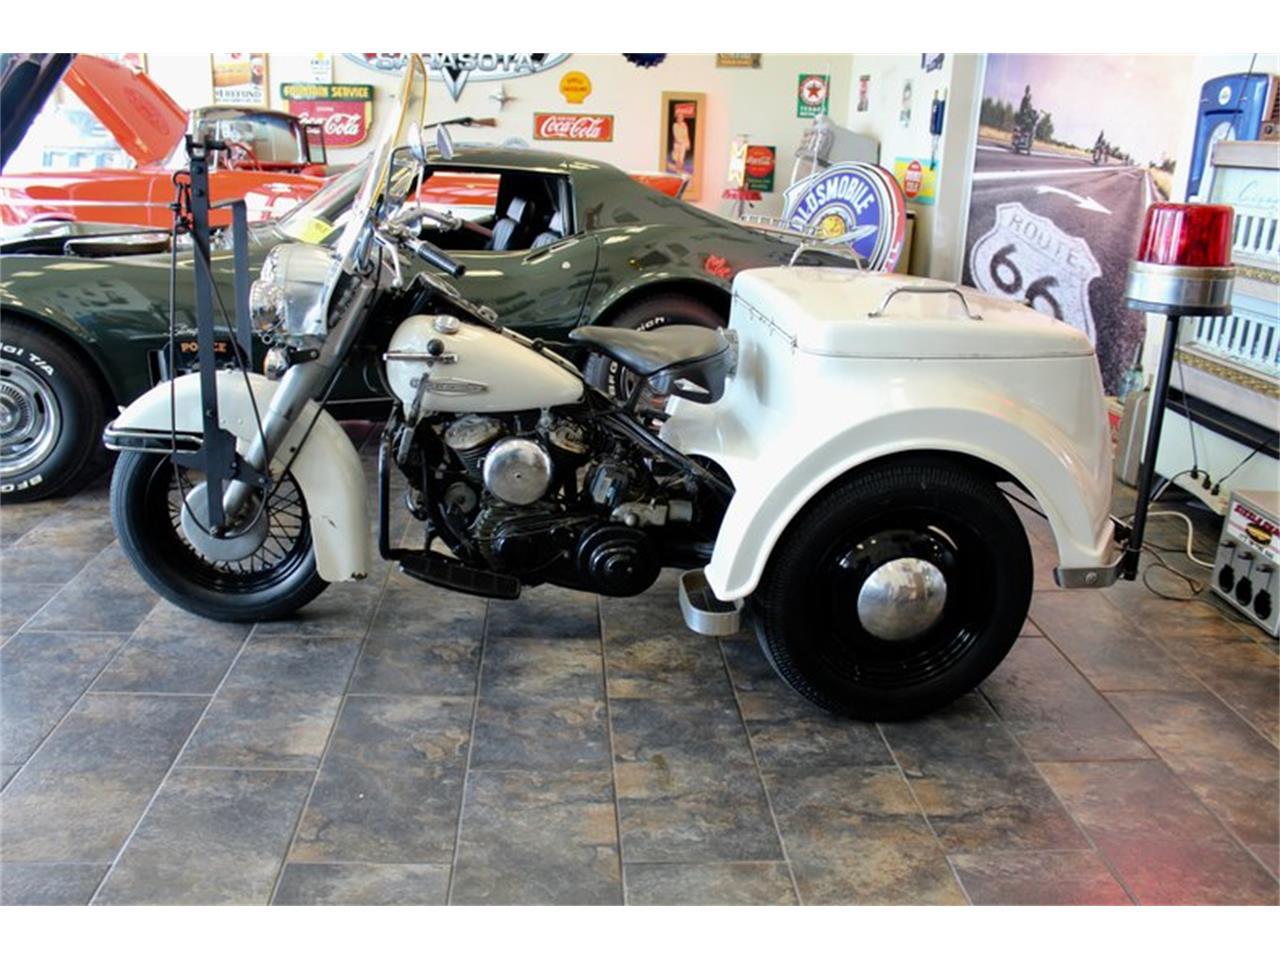 Harley Davidson Motorcycles For Sale >> 1967 Harley Davidson Motorcycle For Sale In Sarasota Fl